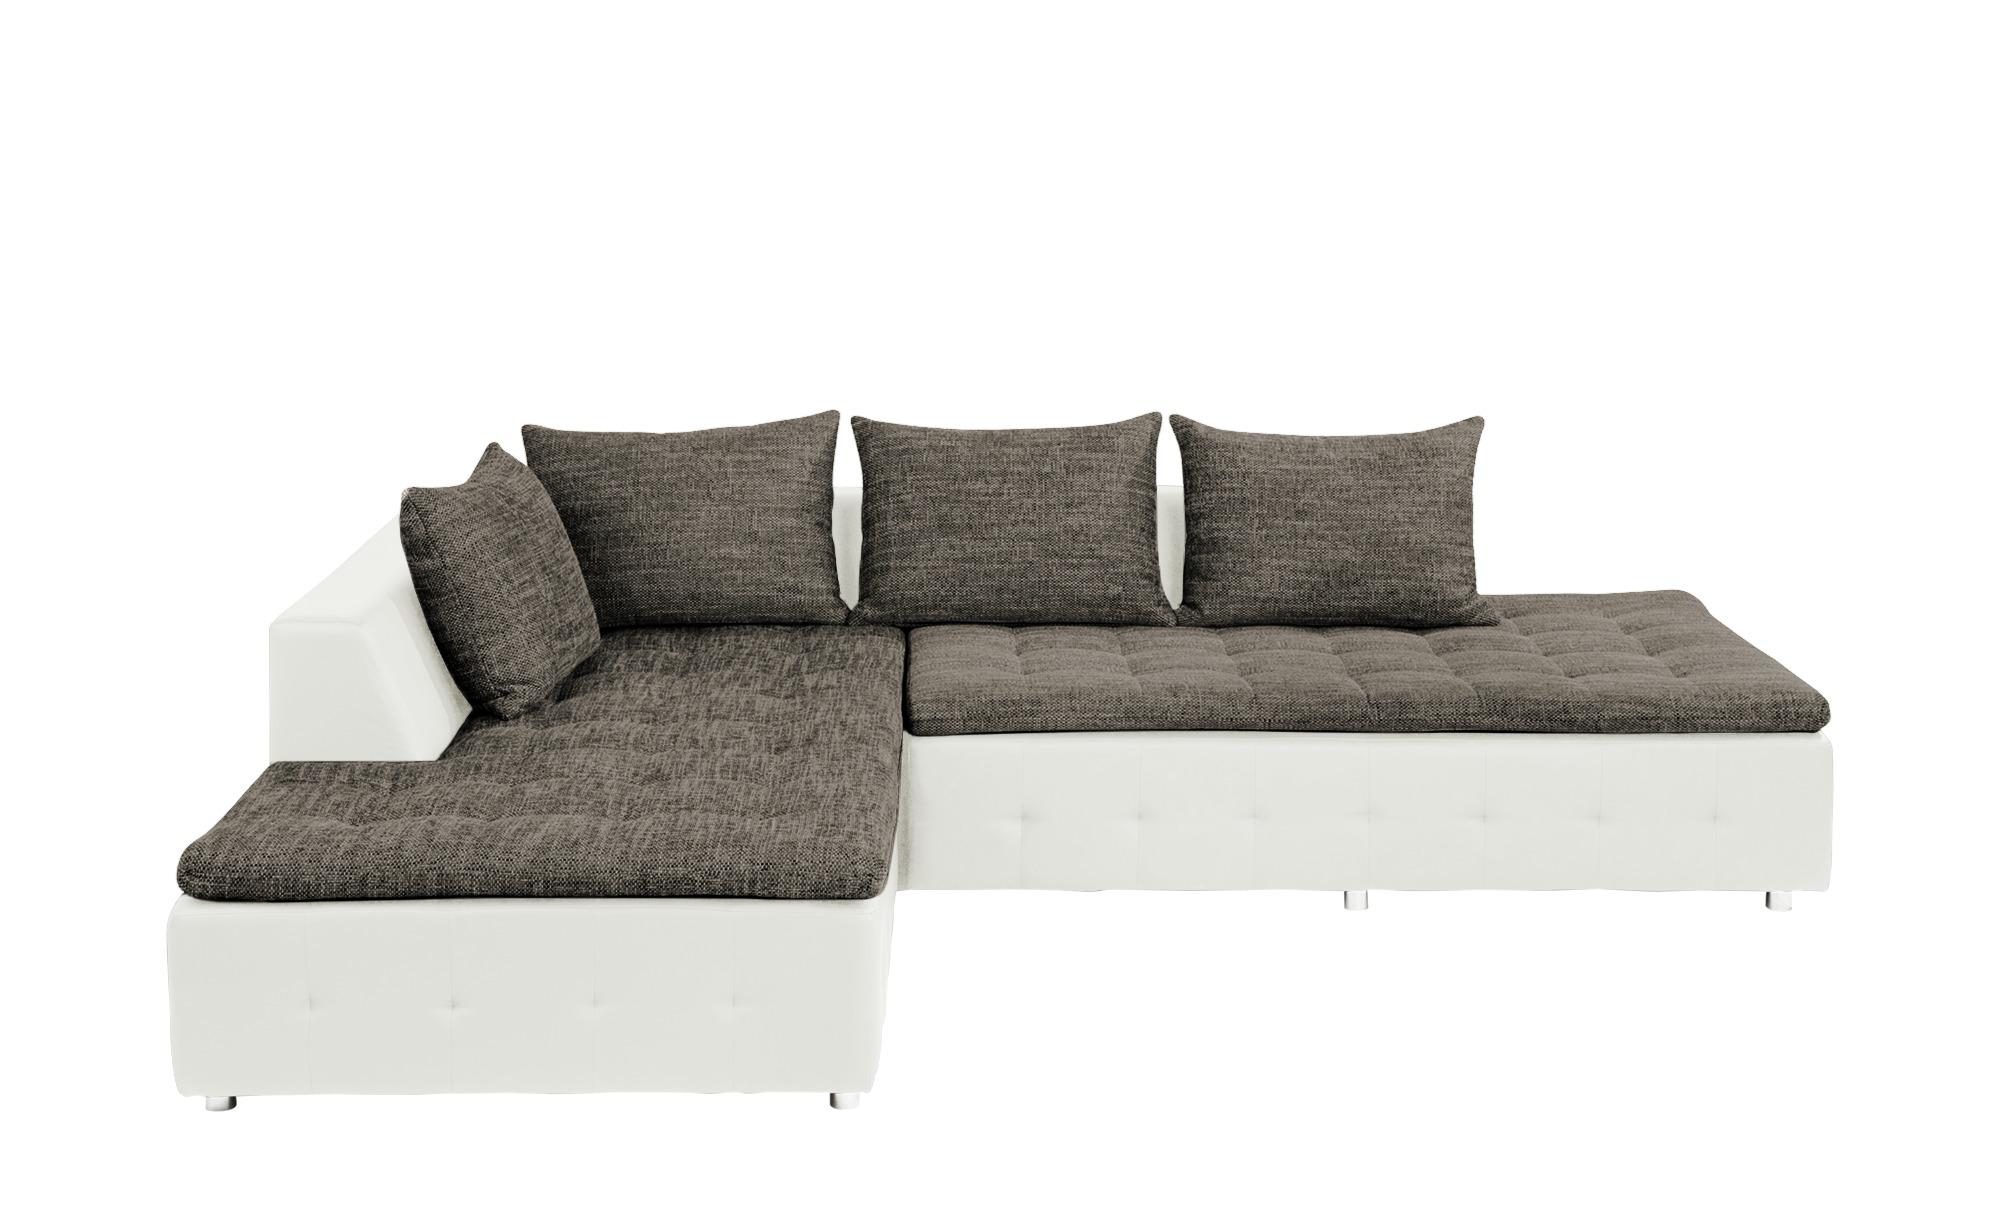 smart Ecksofa weiß/grau - Kunstleder/Webstoff Salvia ¦ weiß Polstermöbel > Sofas > Ecksofas - Höffner